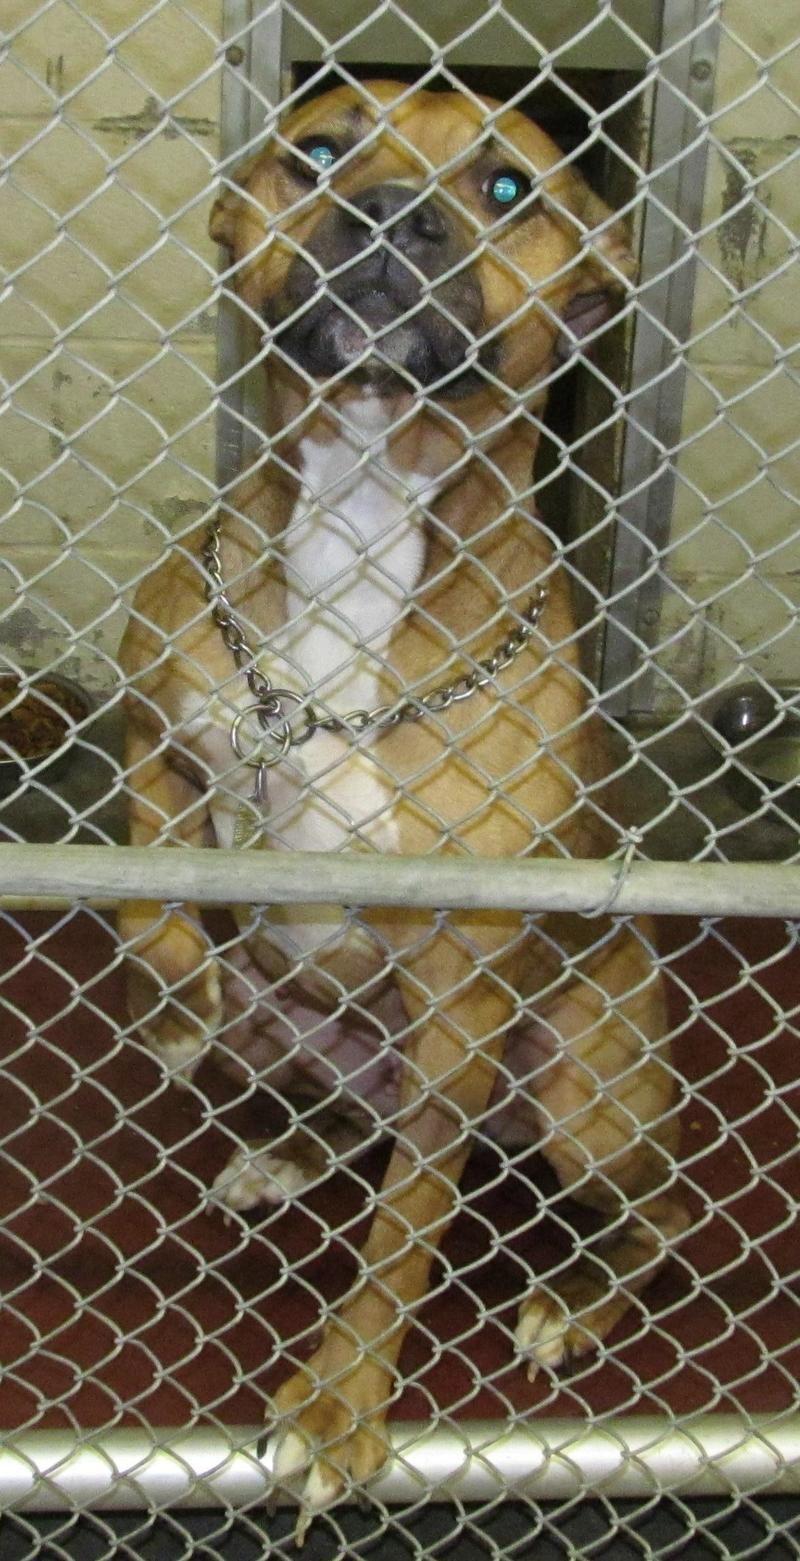 16+ Wetzel county animal shelter ideas